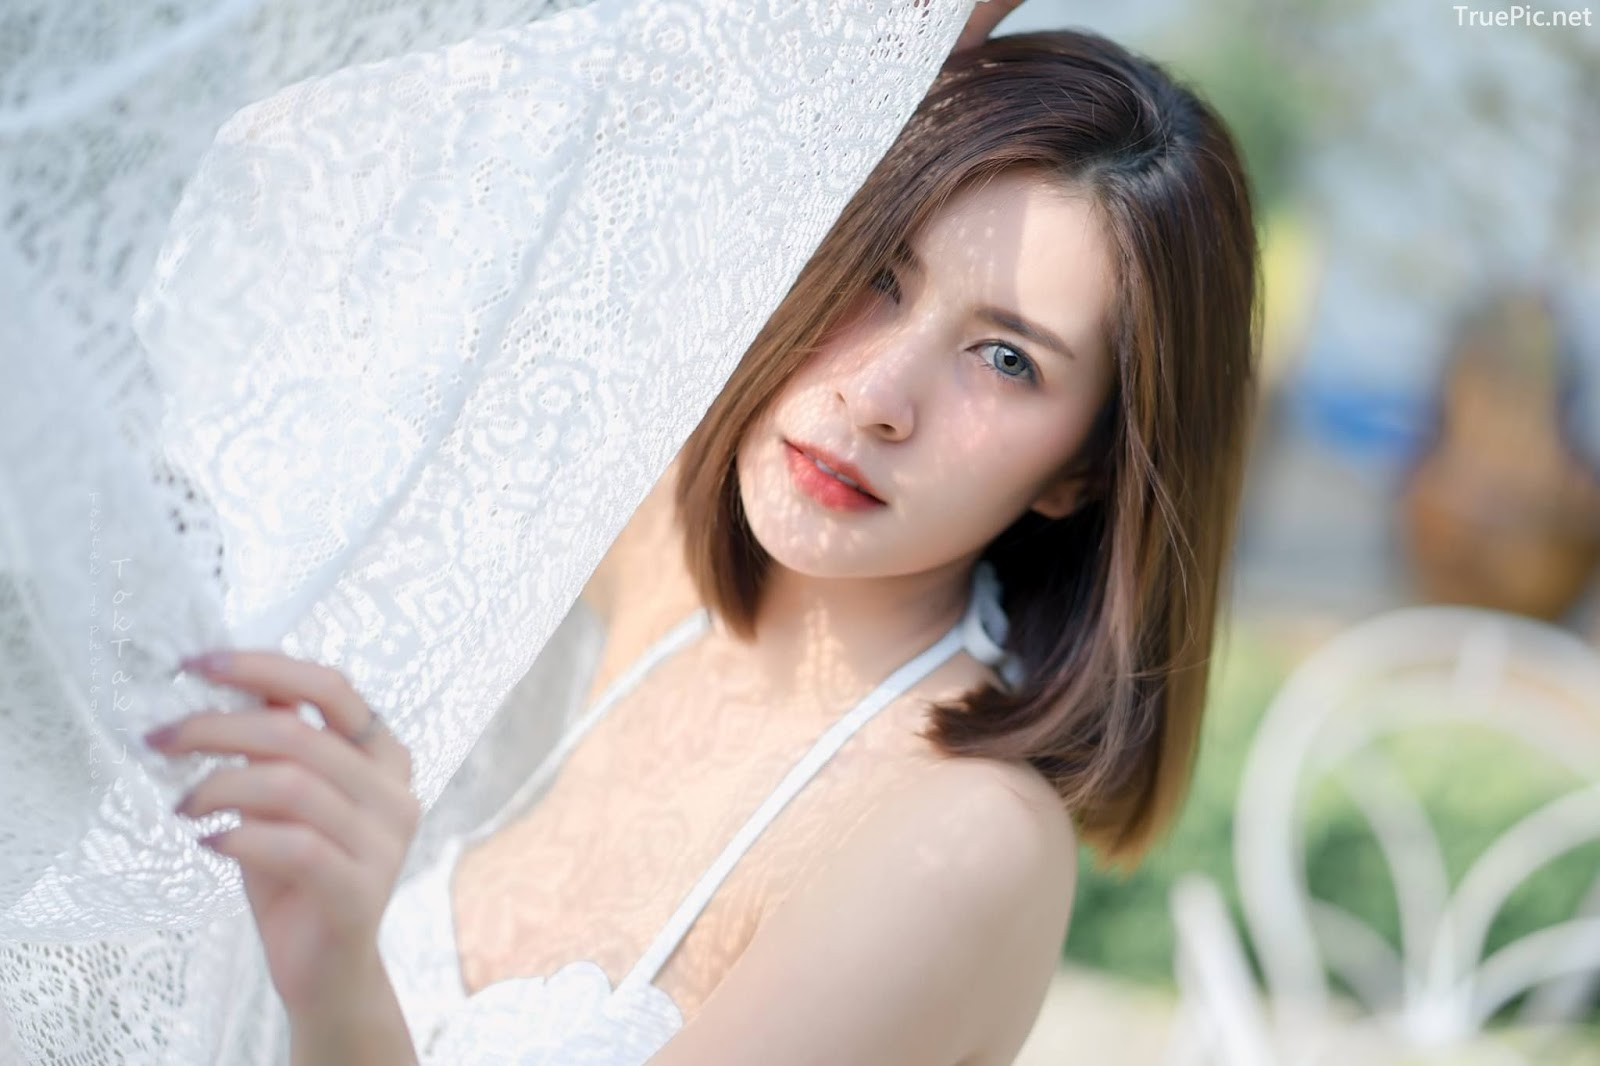 Thailand hot model MIldd Thanyarath Sriudomloert - Sexy 2 Piece Swimsuits - Picture 9